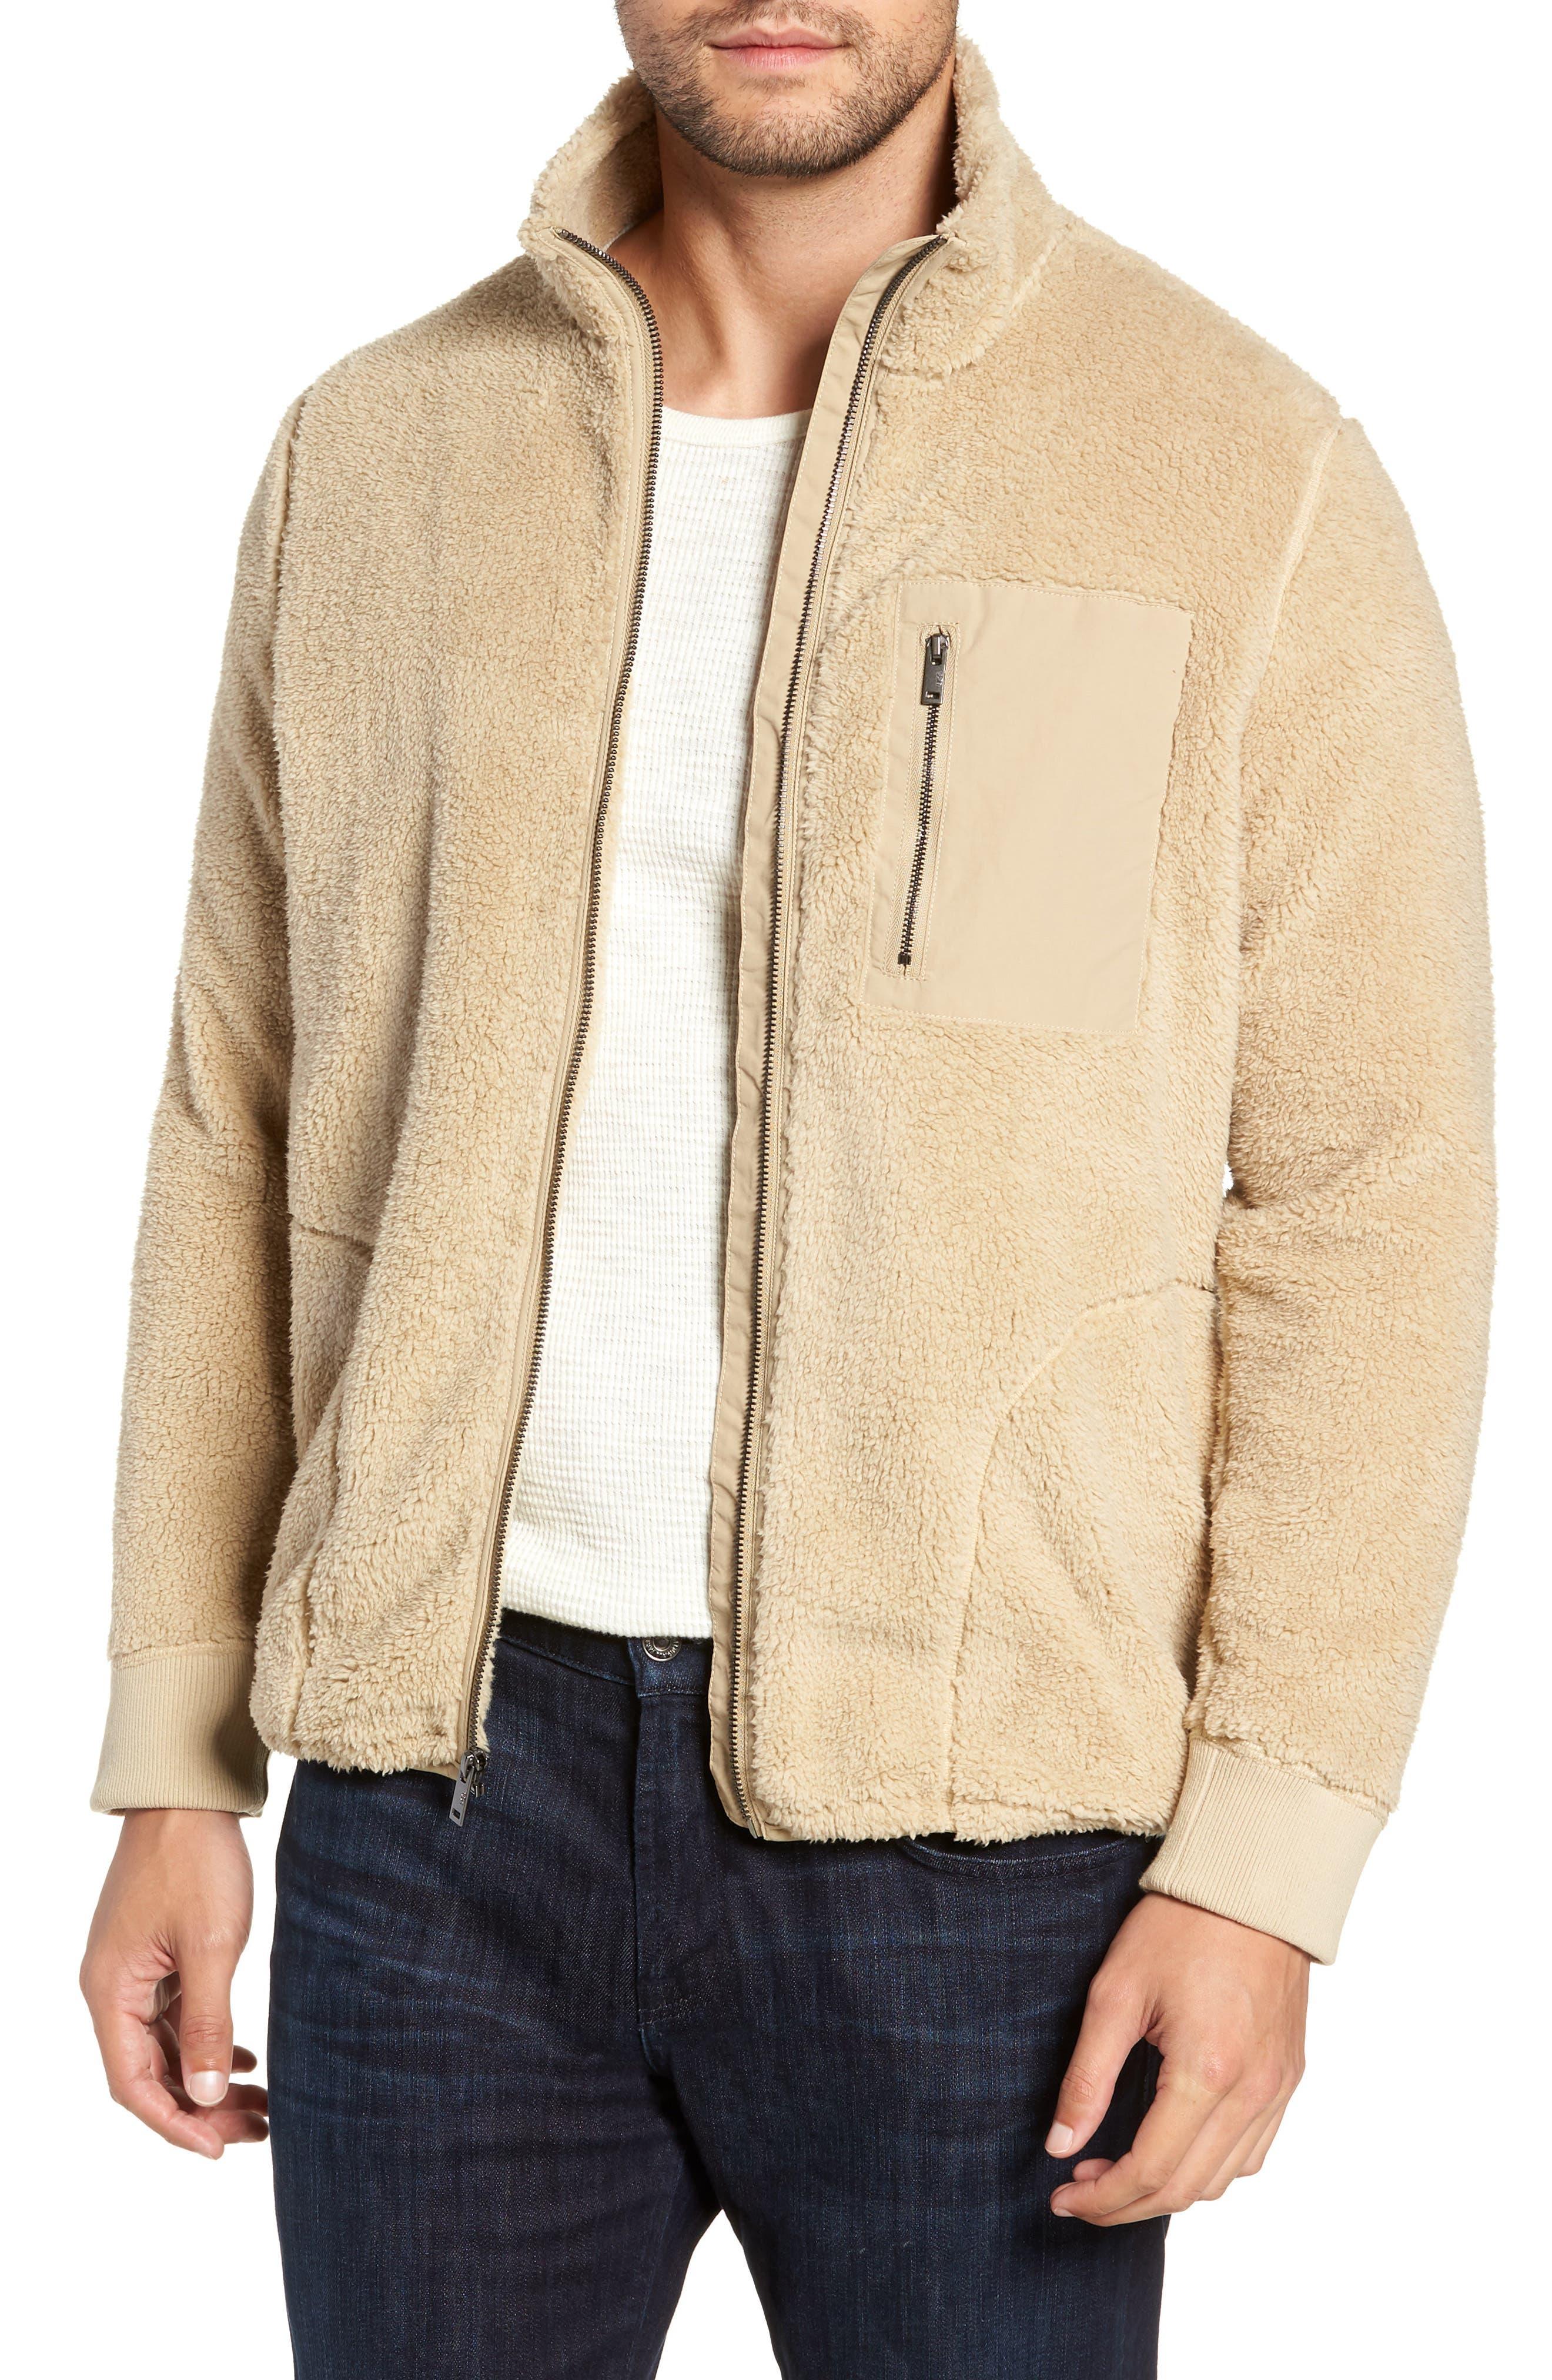 Lucas High Pile Fleece Sweater Jacket,                             Main thumbnail 1, color,                             SAND